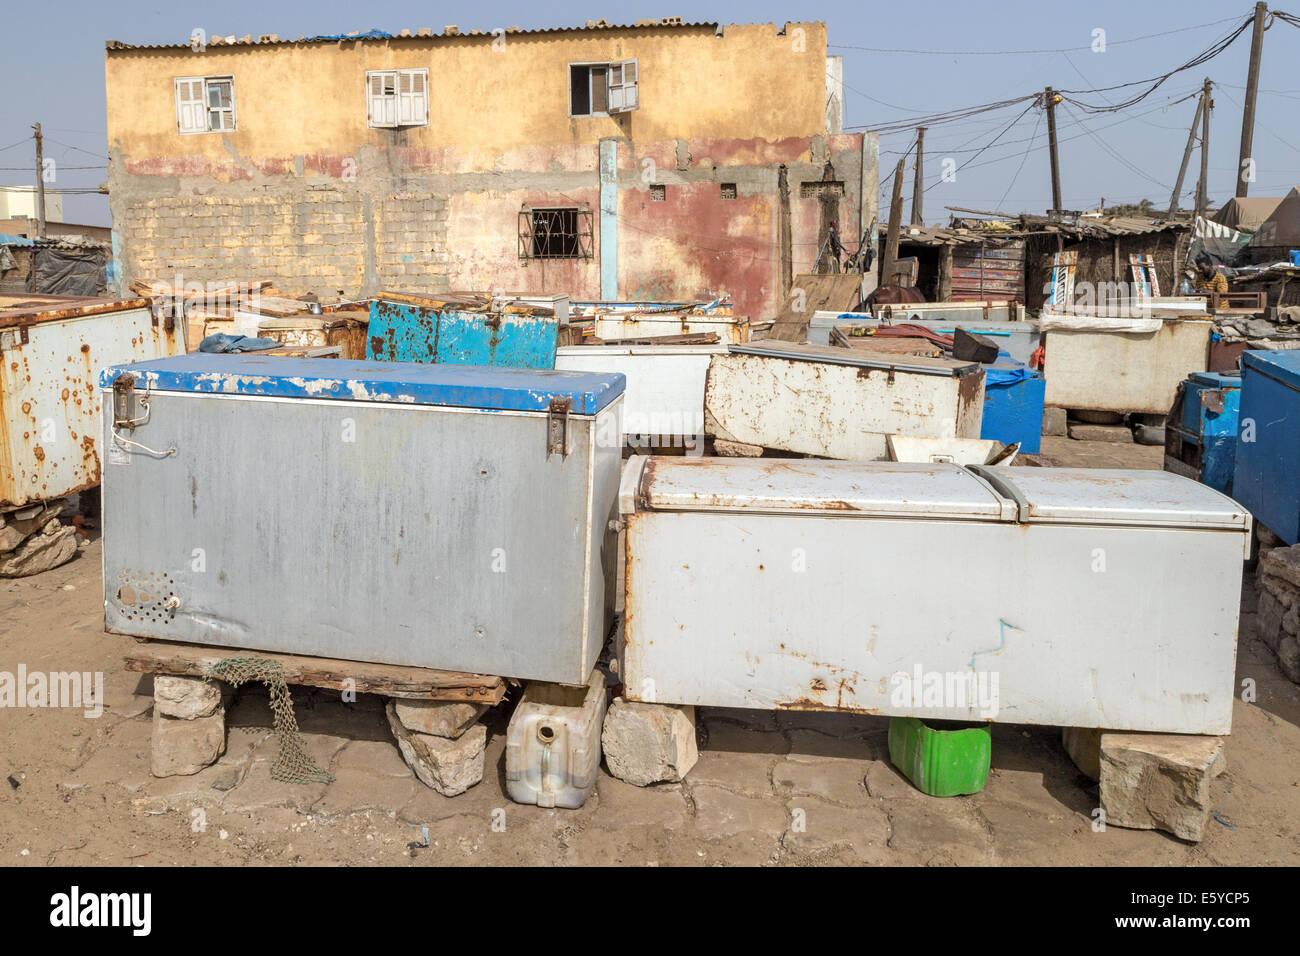 Fridges keeping the freshly landed fish Kayar Senegal - Stock Image